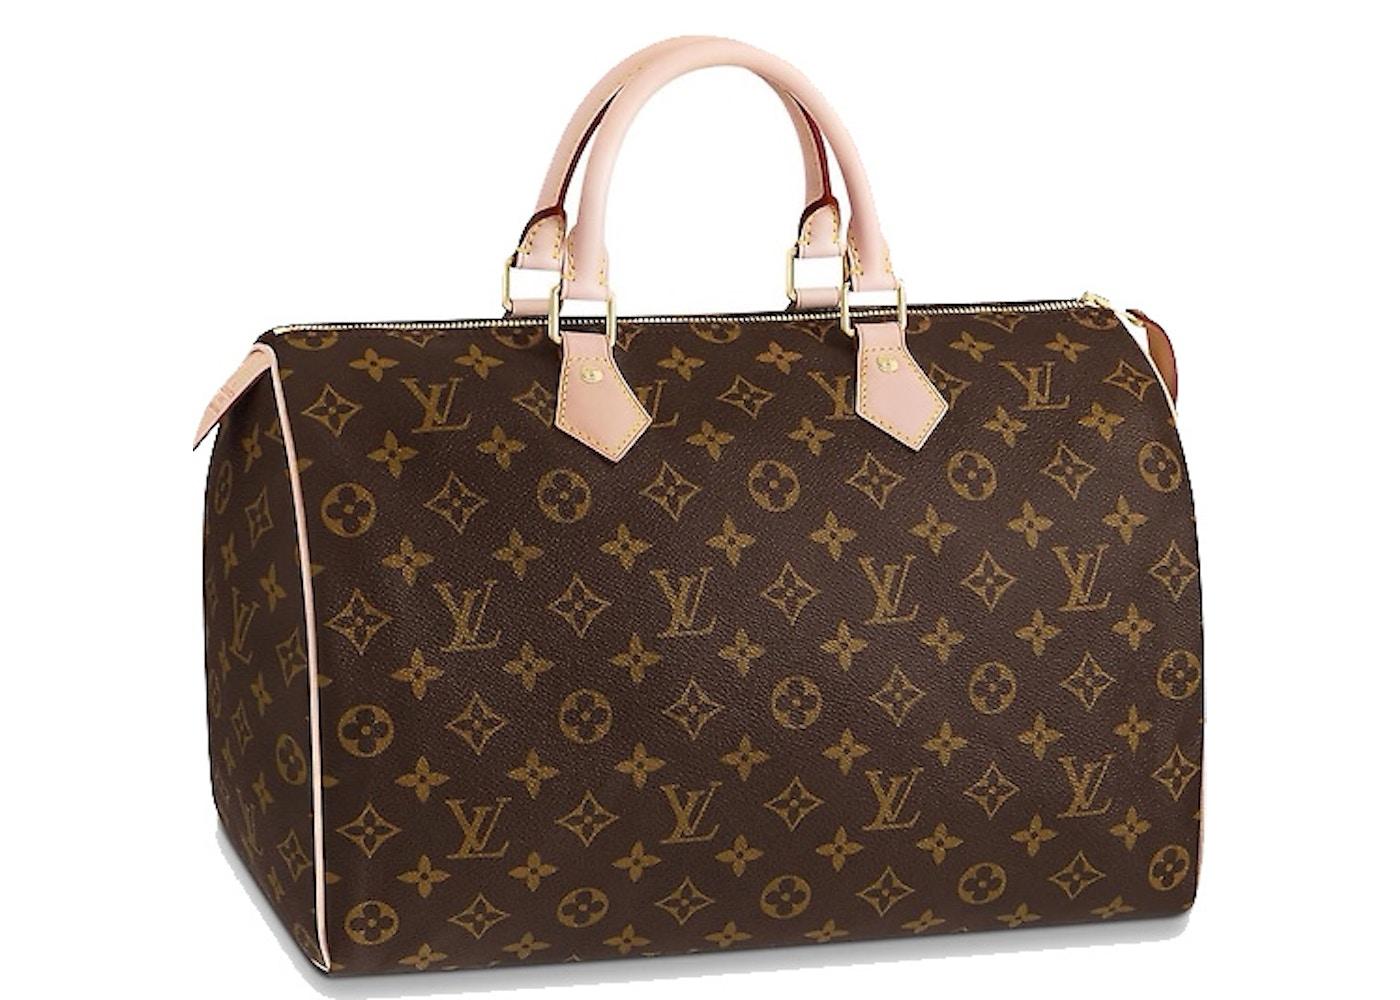 71c4aeb60bc9 Louis Vuitton Speedy Monogram 35 Brown. Monogram 35 Brown